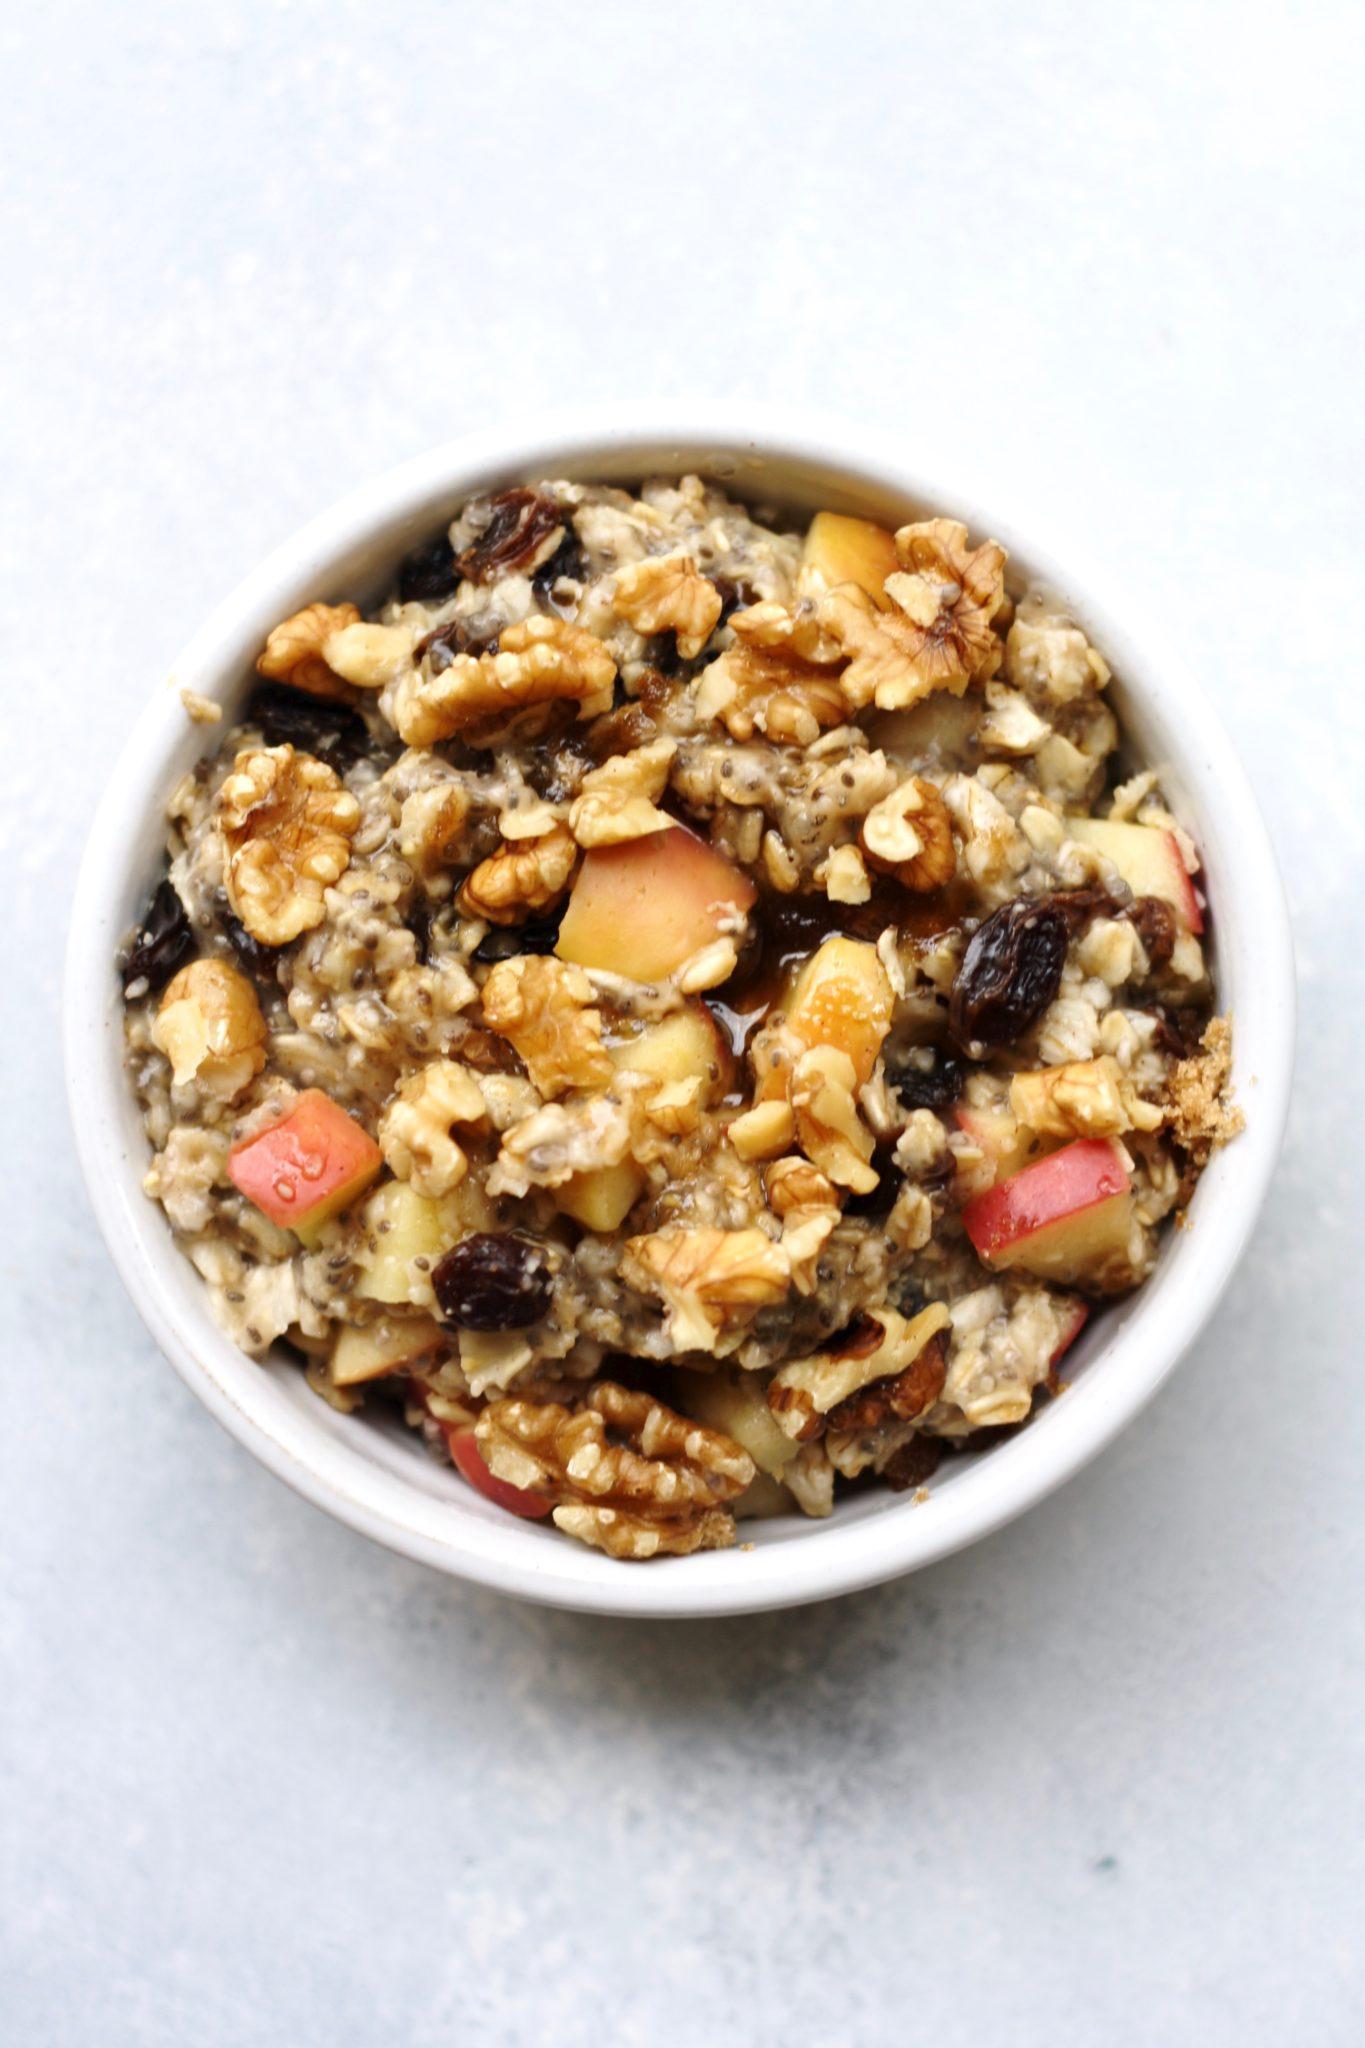 cinnamon raisin apple walnut oatmeal // cait's plate